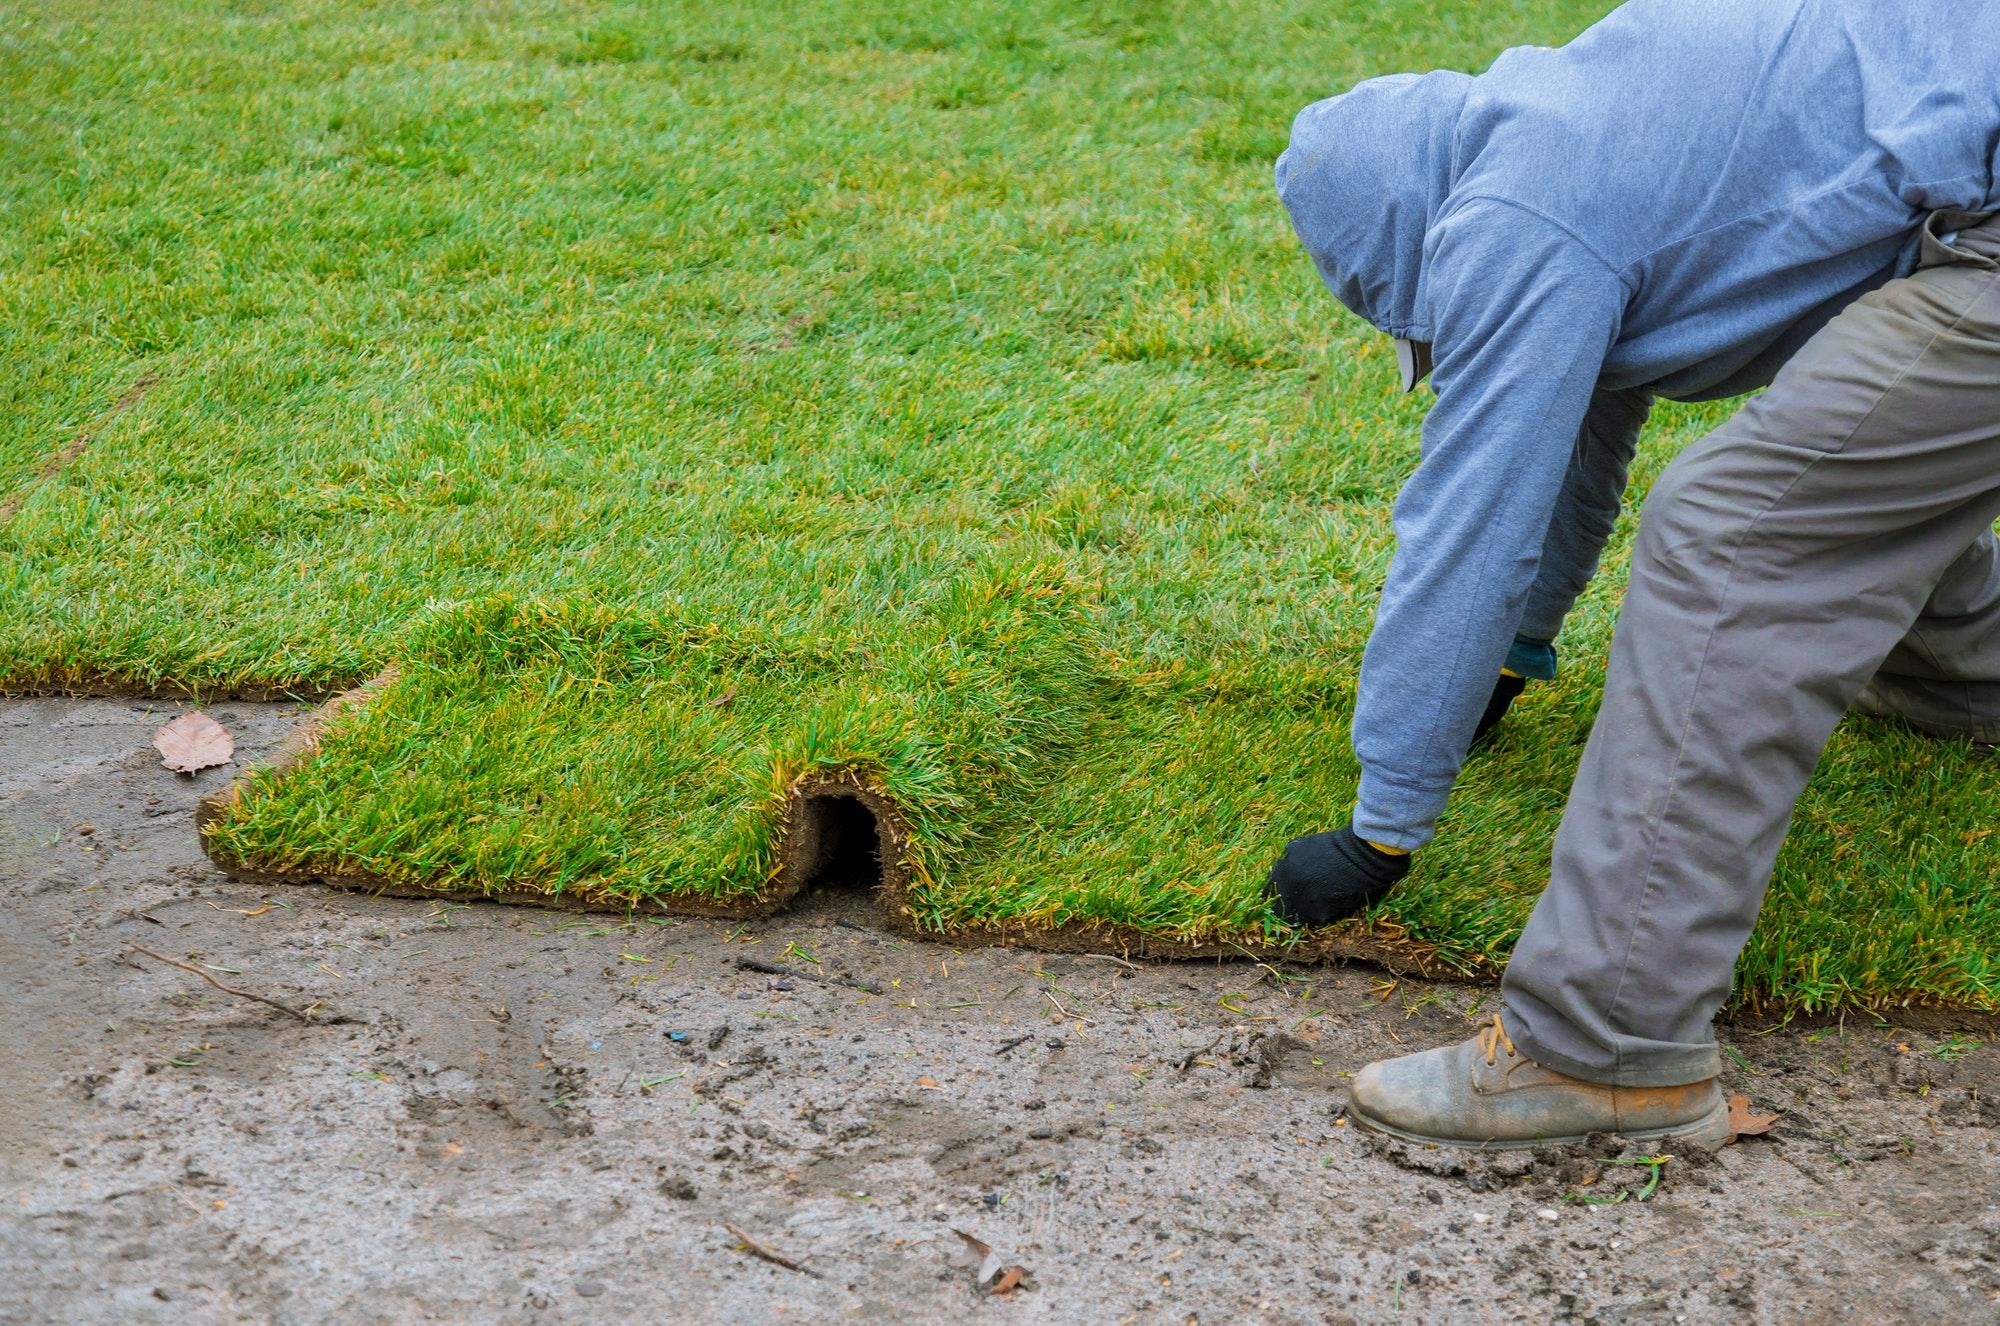 Gardener installing natural grass turf professional installer beautiful rolled sod lawn field.